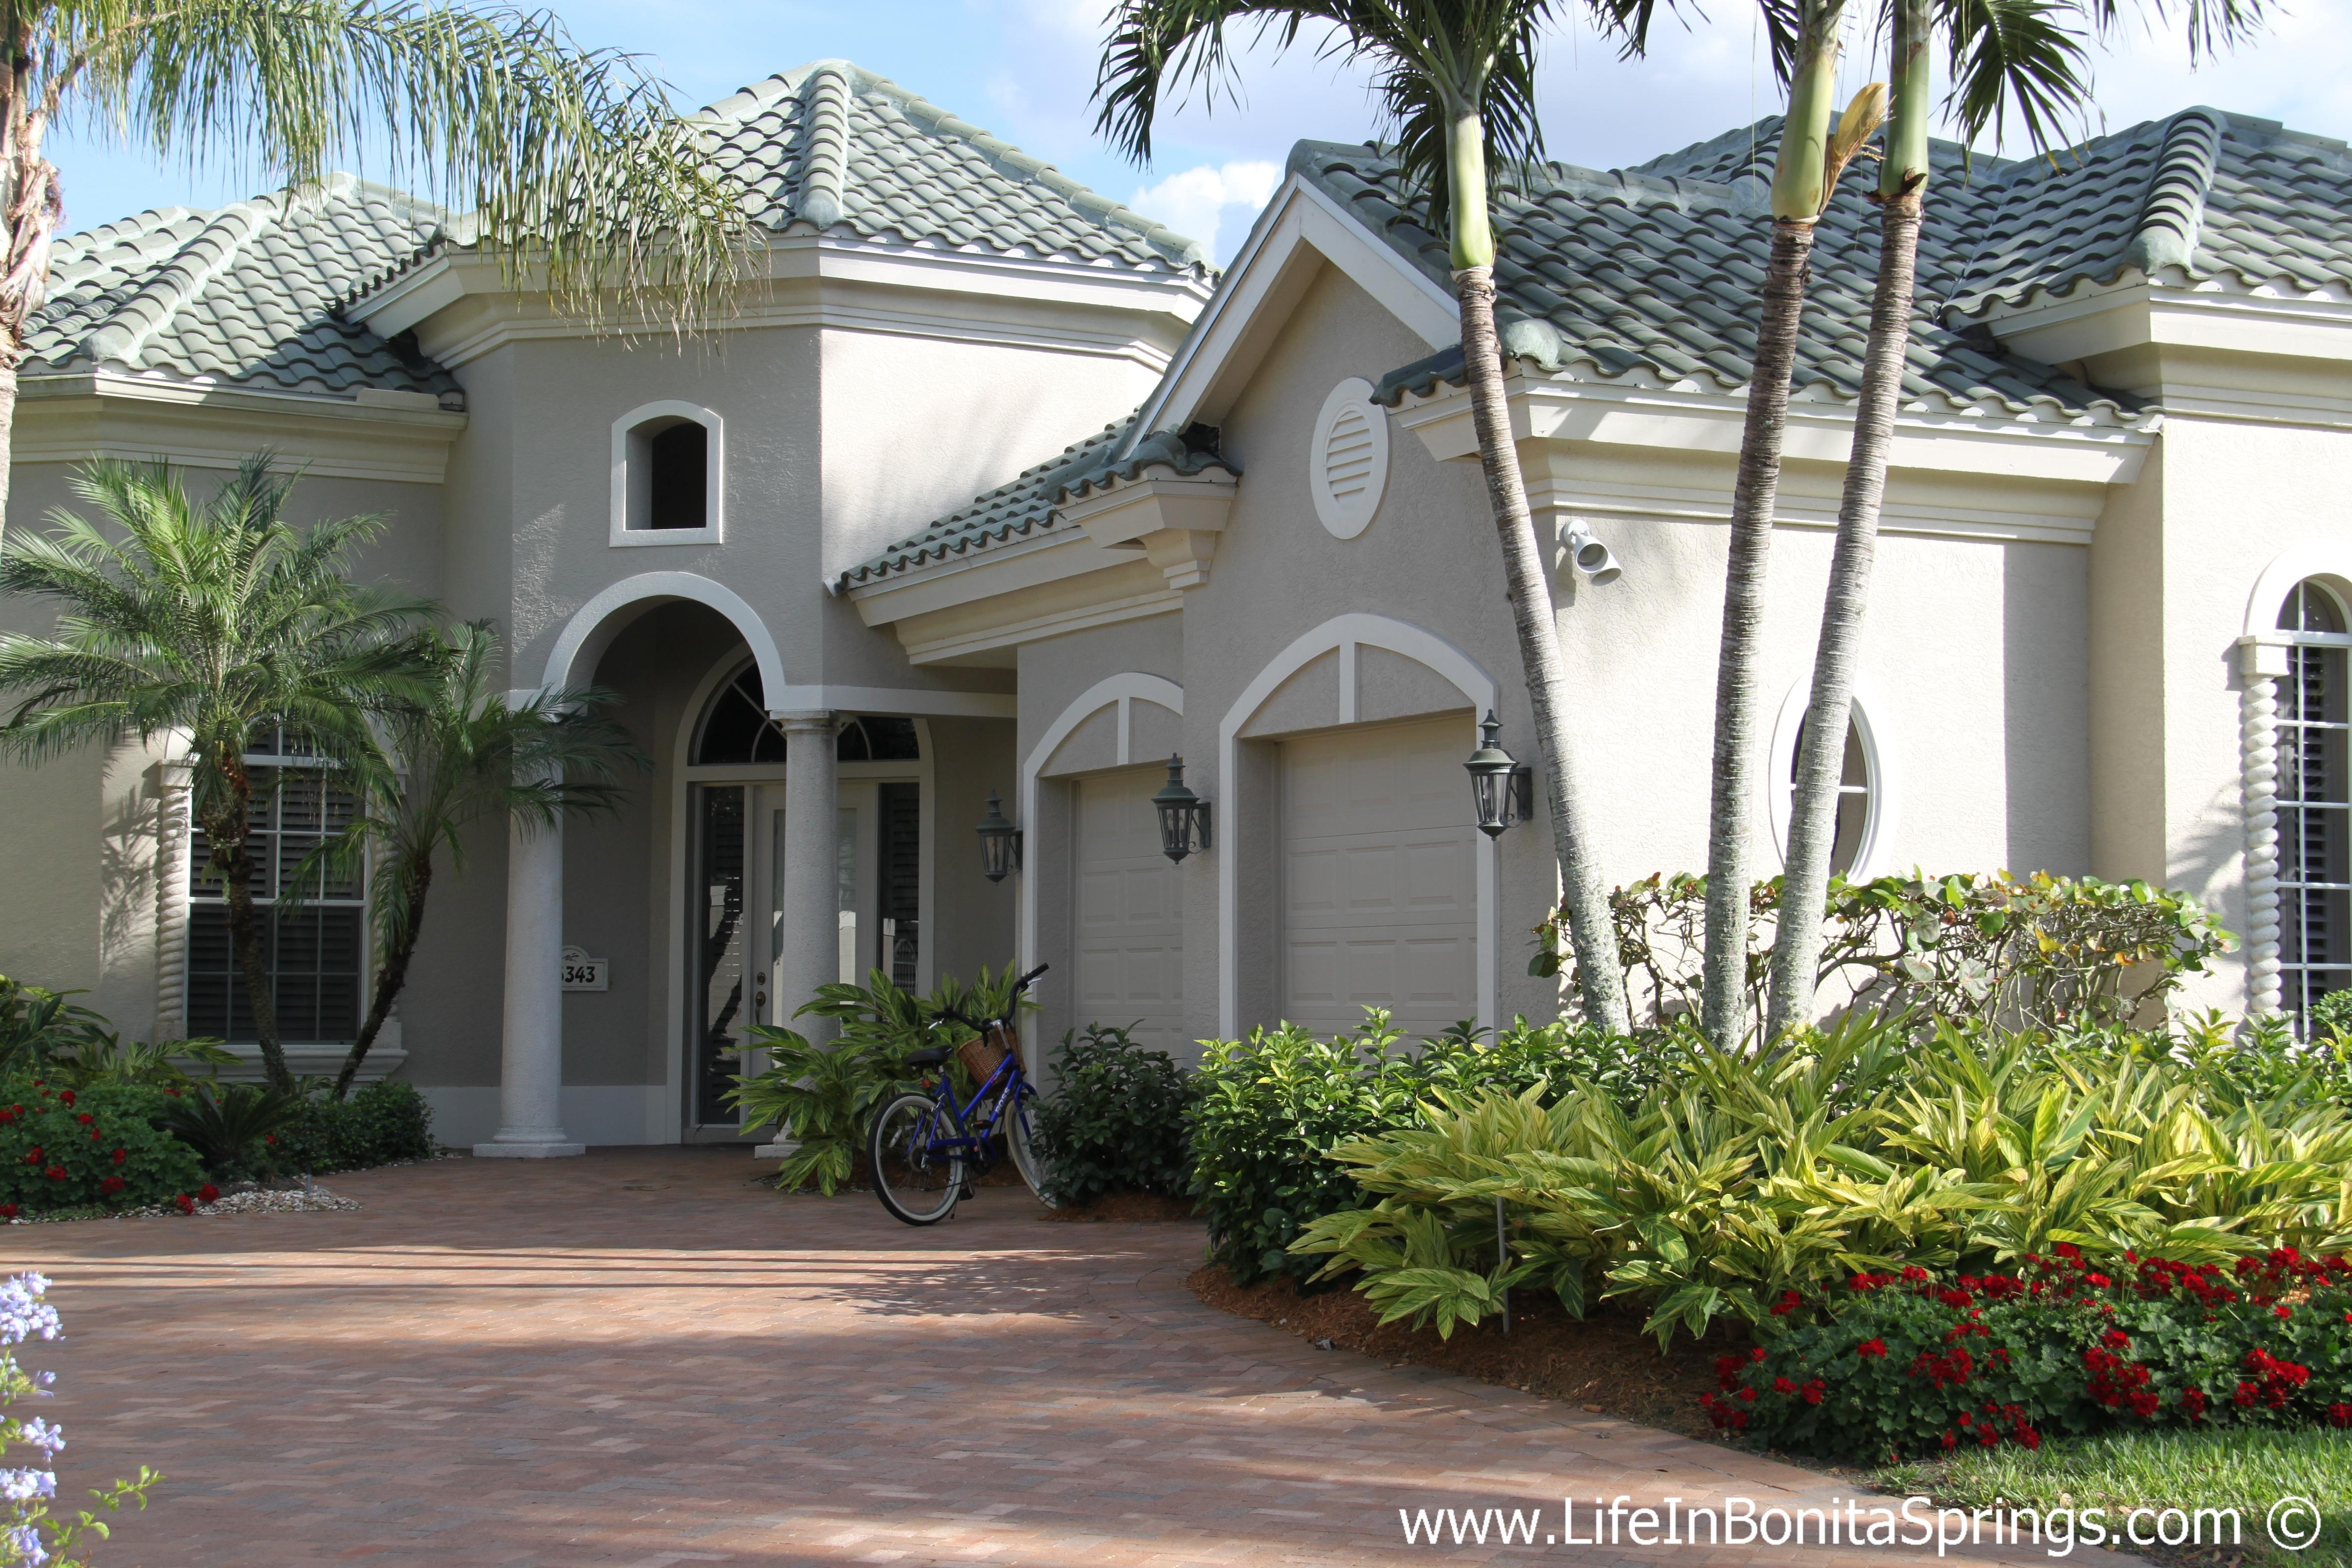 How Long to Sell Bonita Springs Home